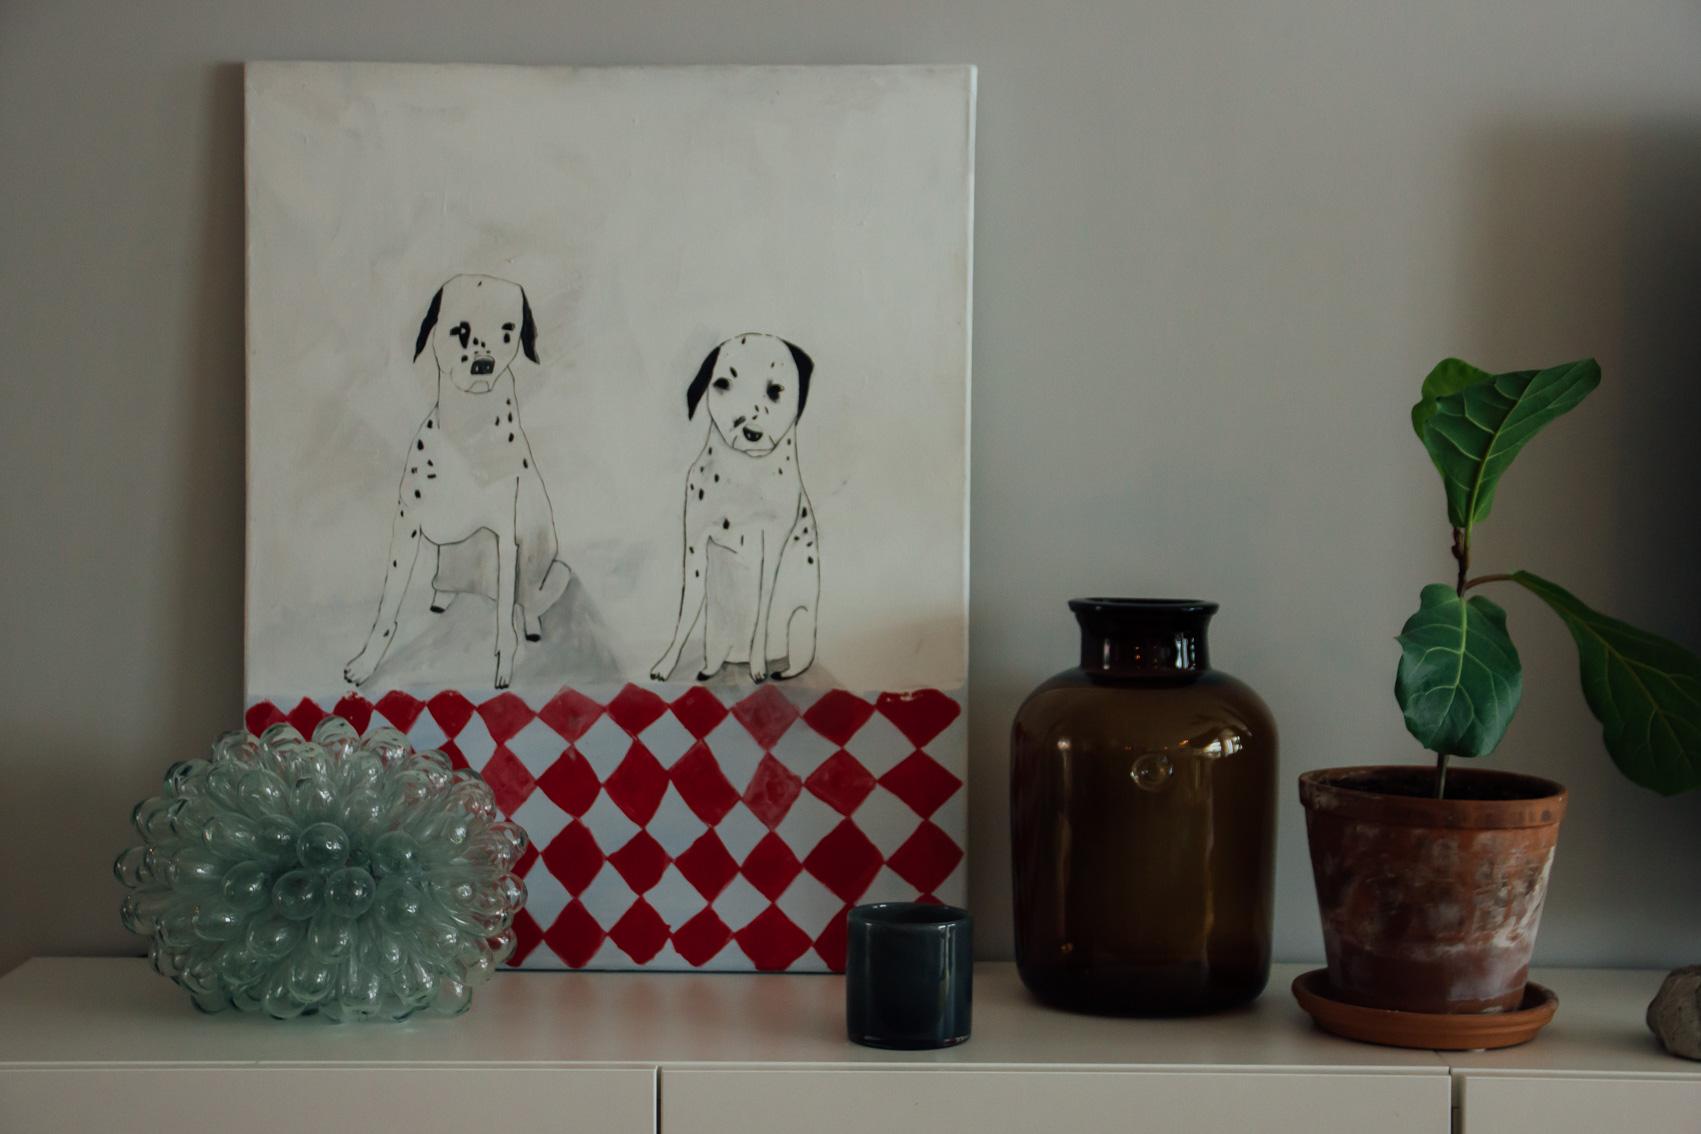 hemma hos trea konst midbec tapeter